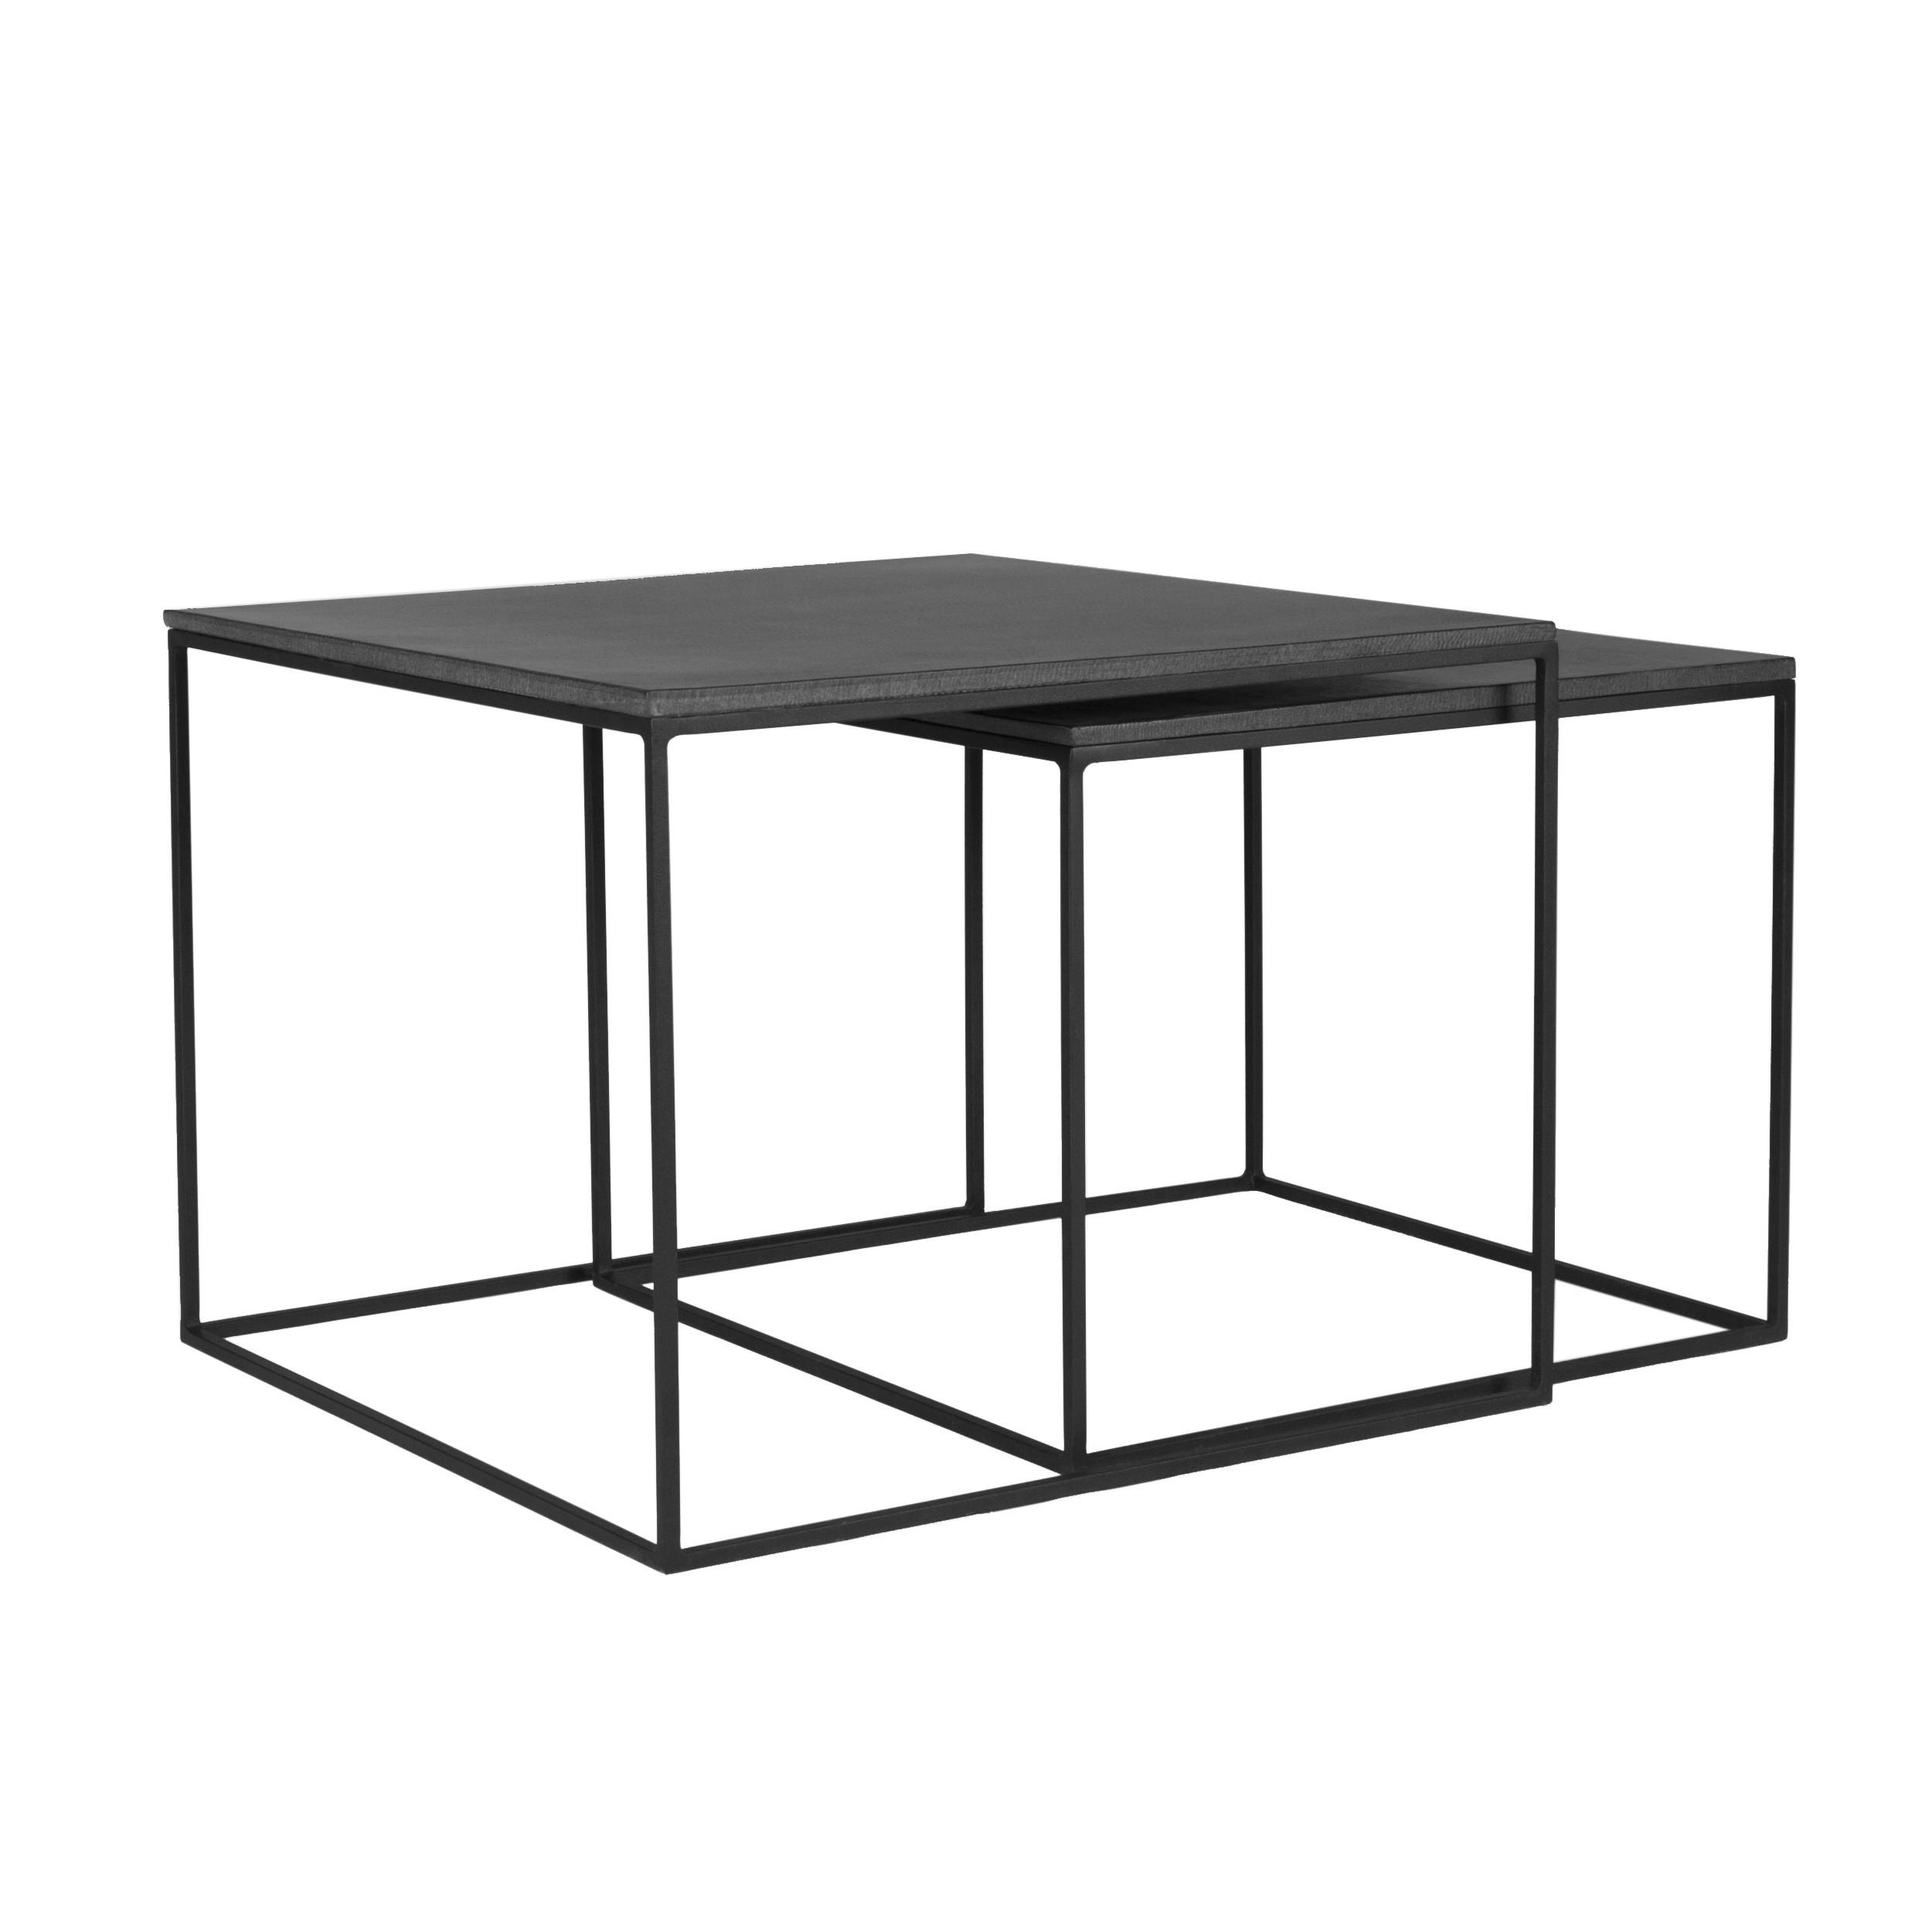 Table basse carrée gigogne